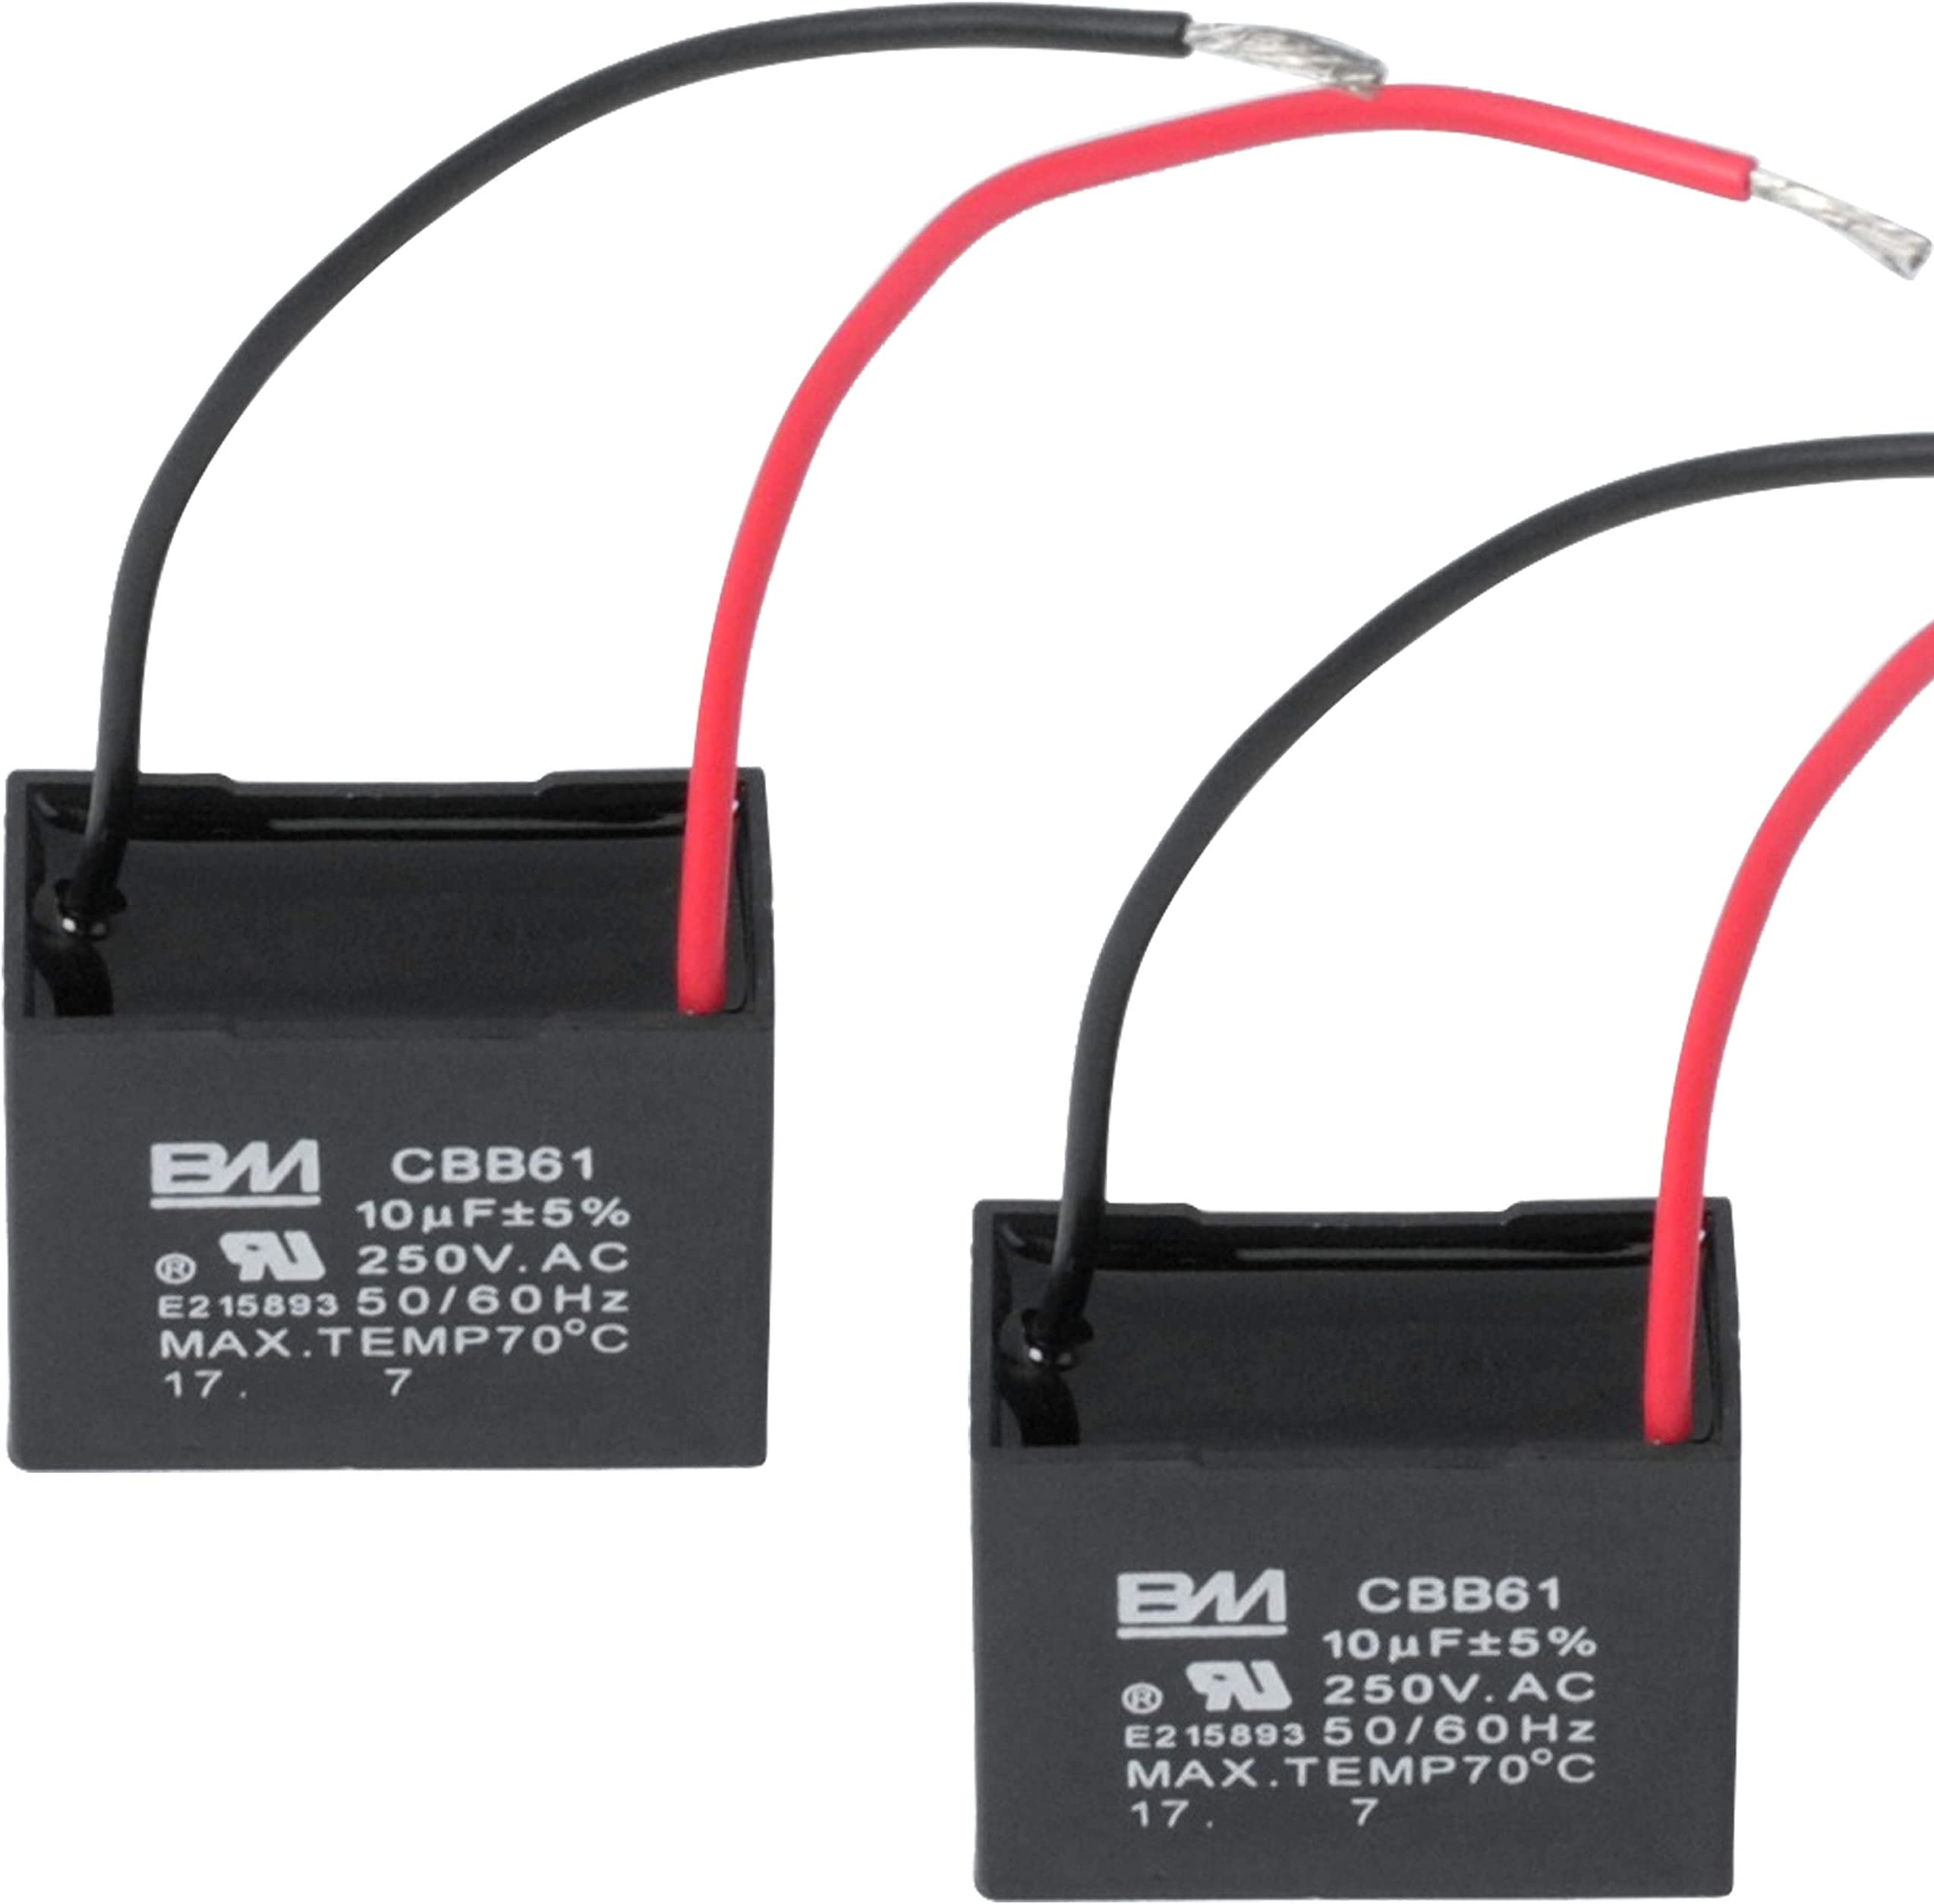 Amazon.com: Wadoy CBB61 Fan Capacitor 2 Wire 10uf, 2 Pack Celiling Fan  Capacitor 250V: Home Audio & TheaterAmazon.com